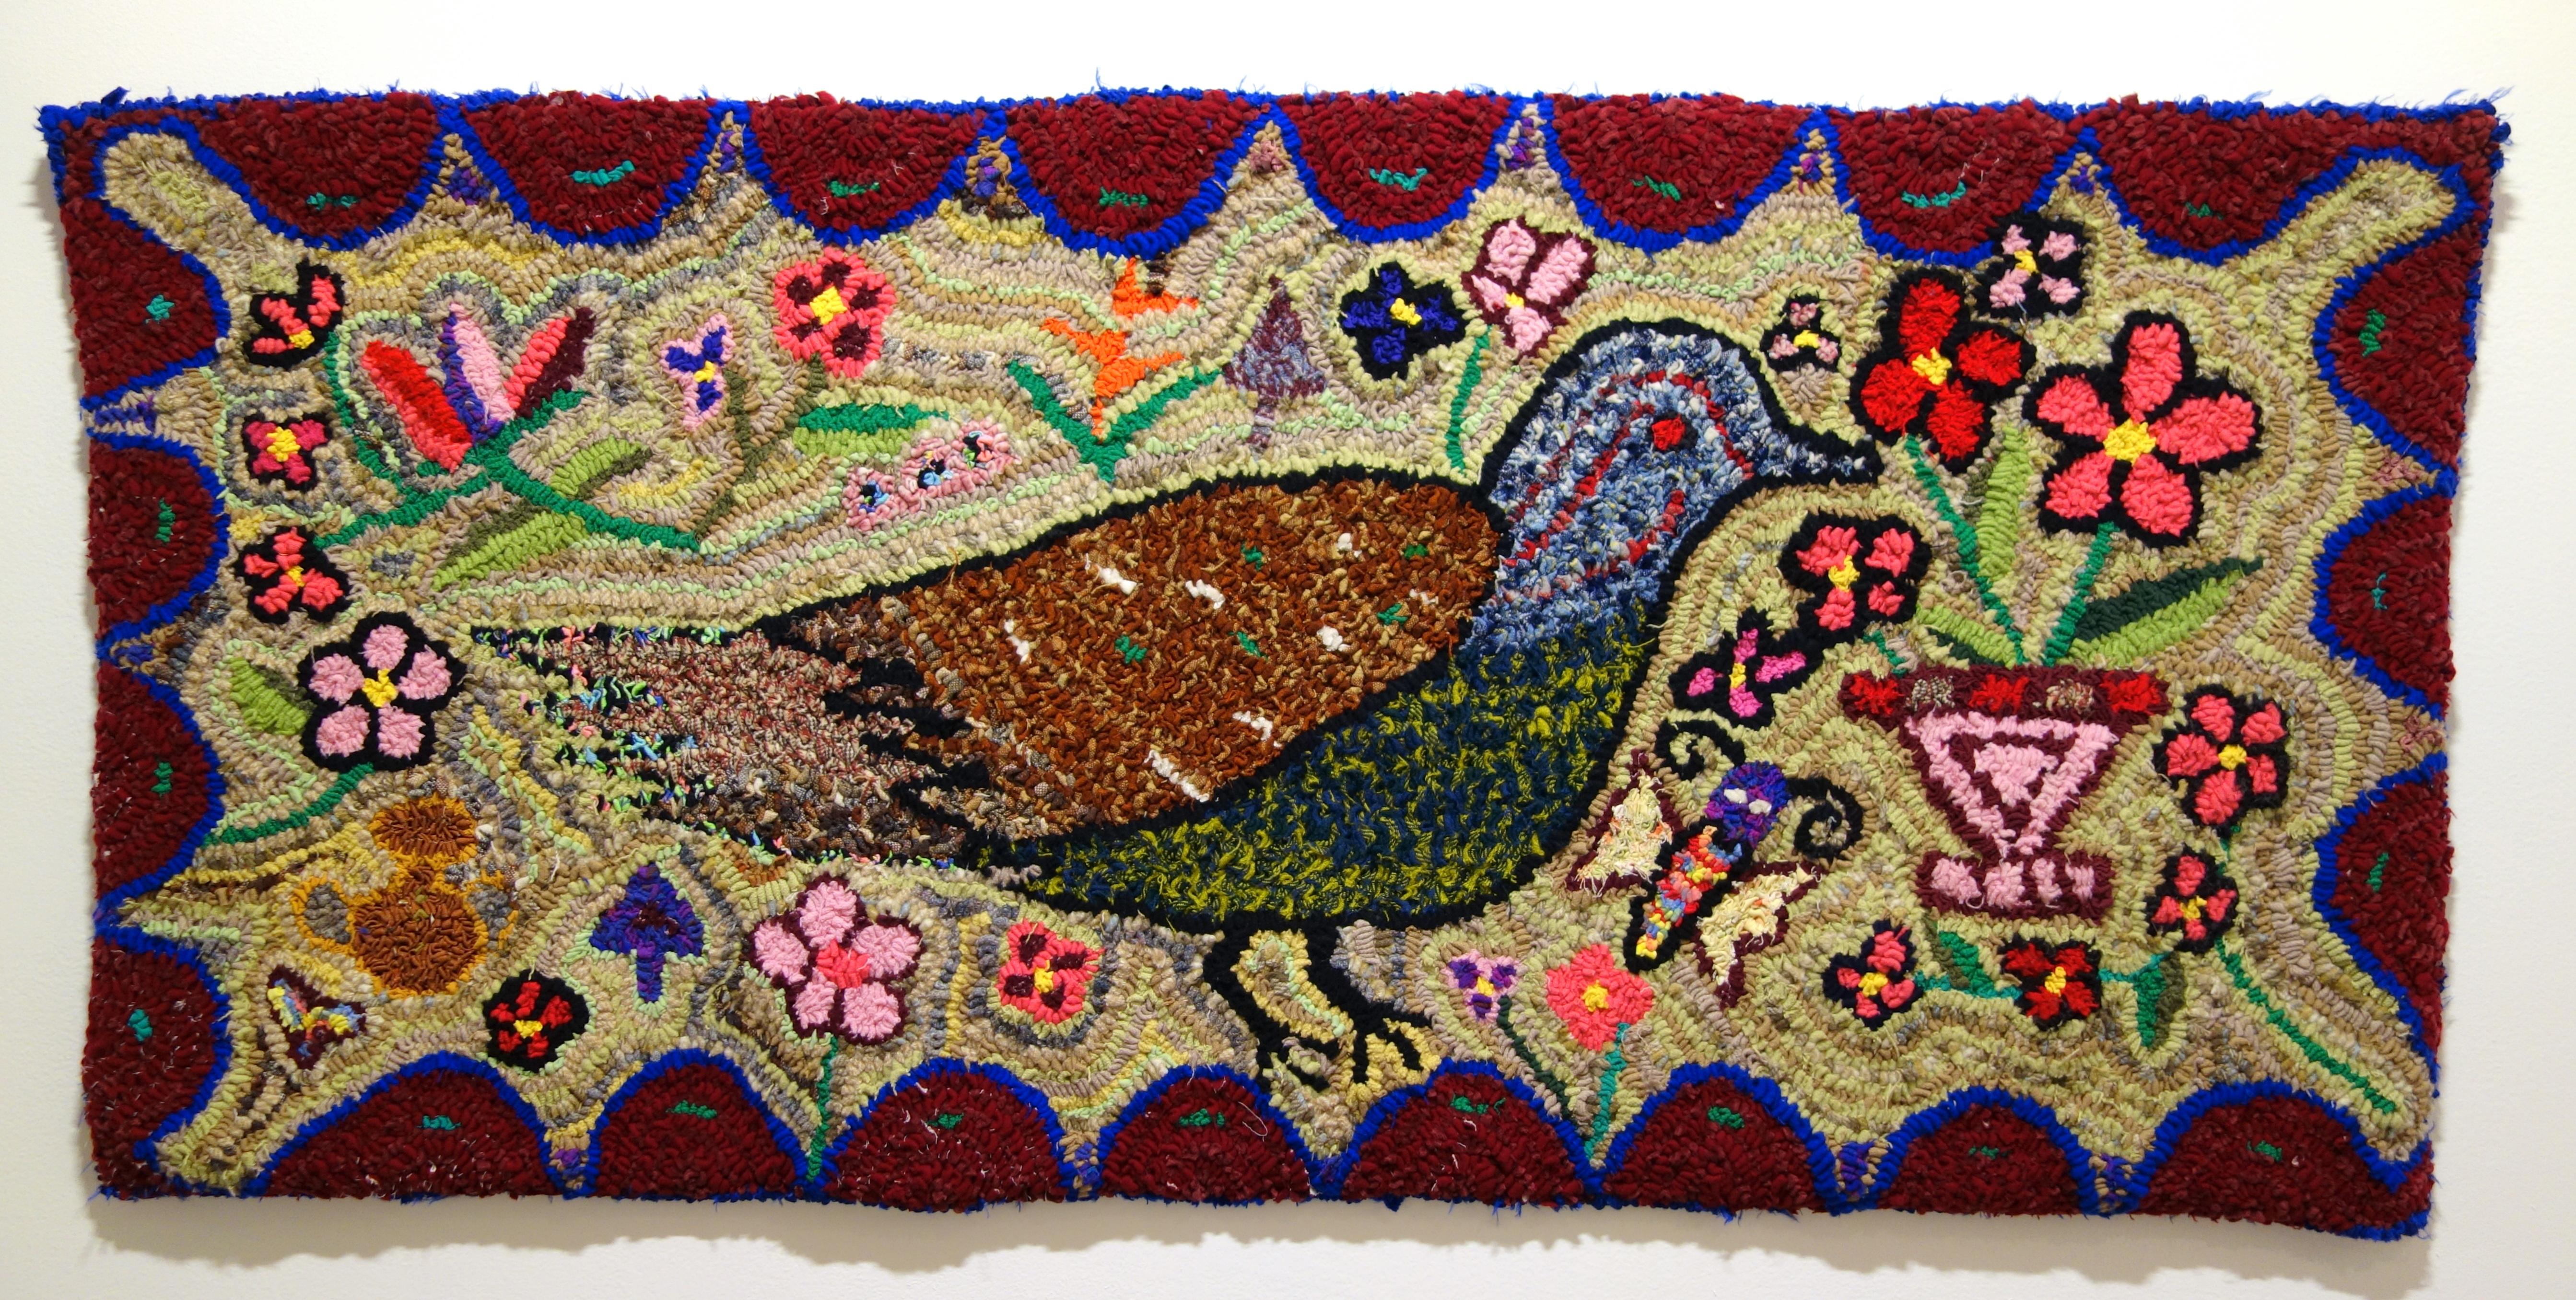 quality blog orig in hooked re weave picture repair artisan hand jackson wy rug rugs